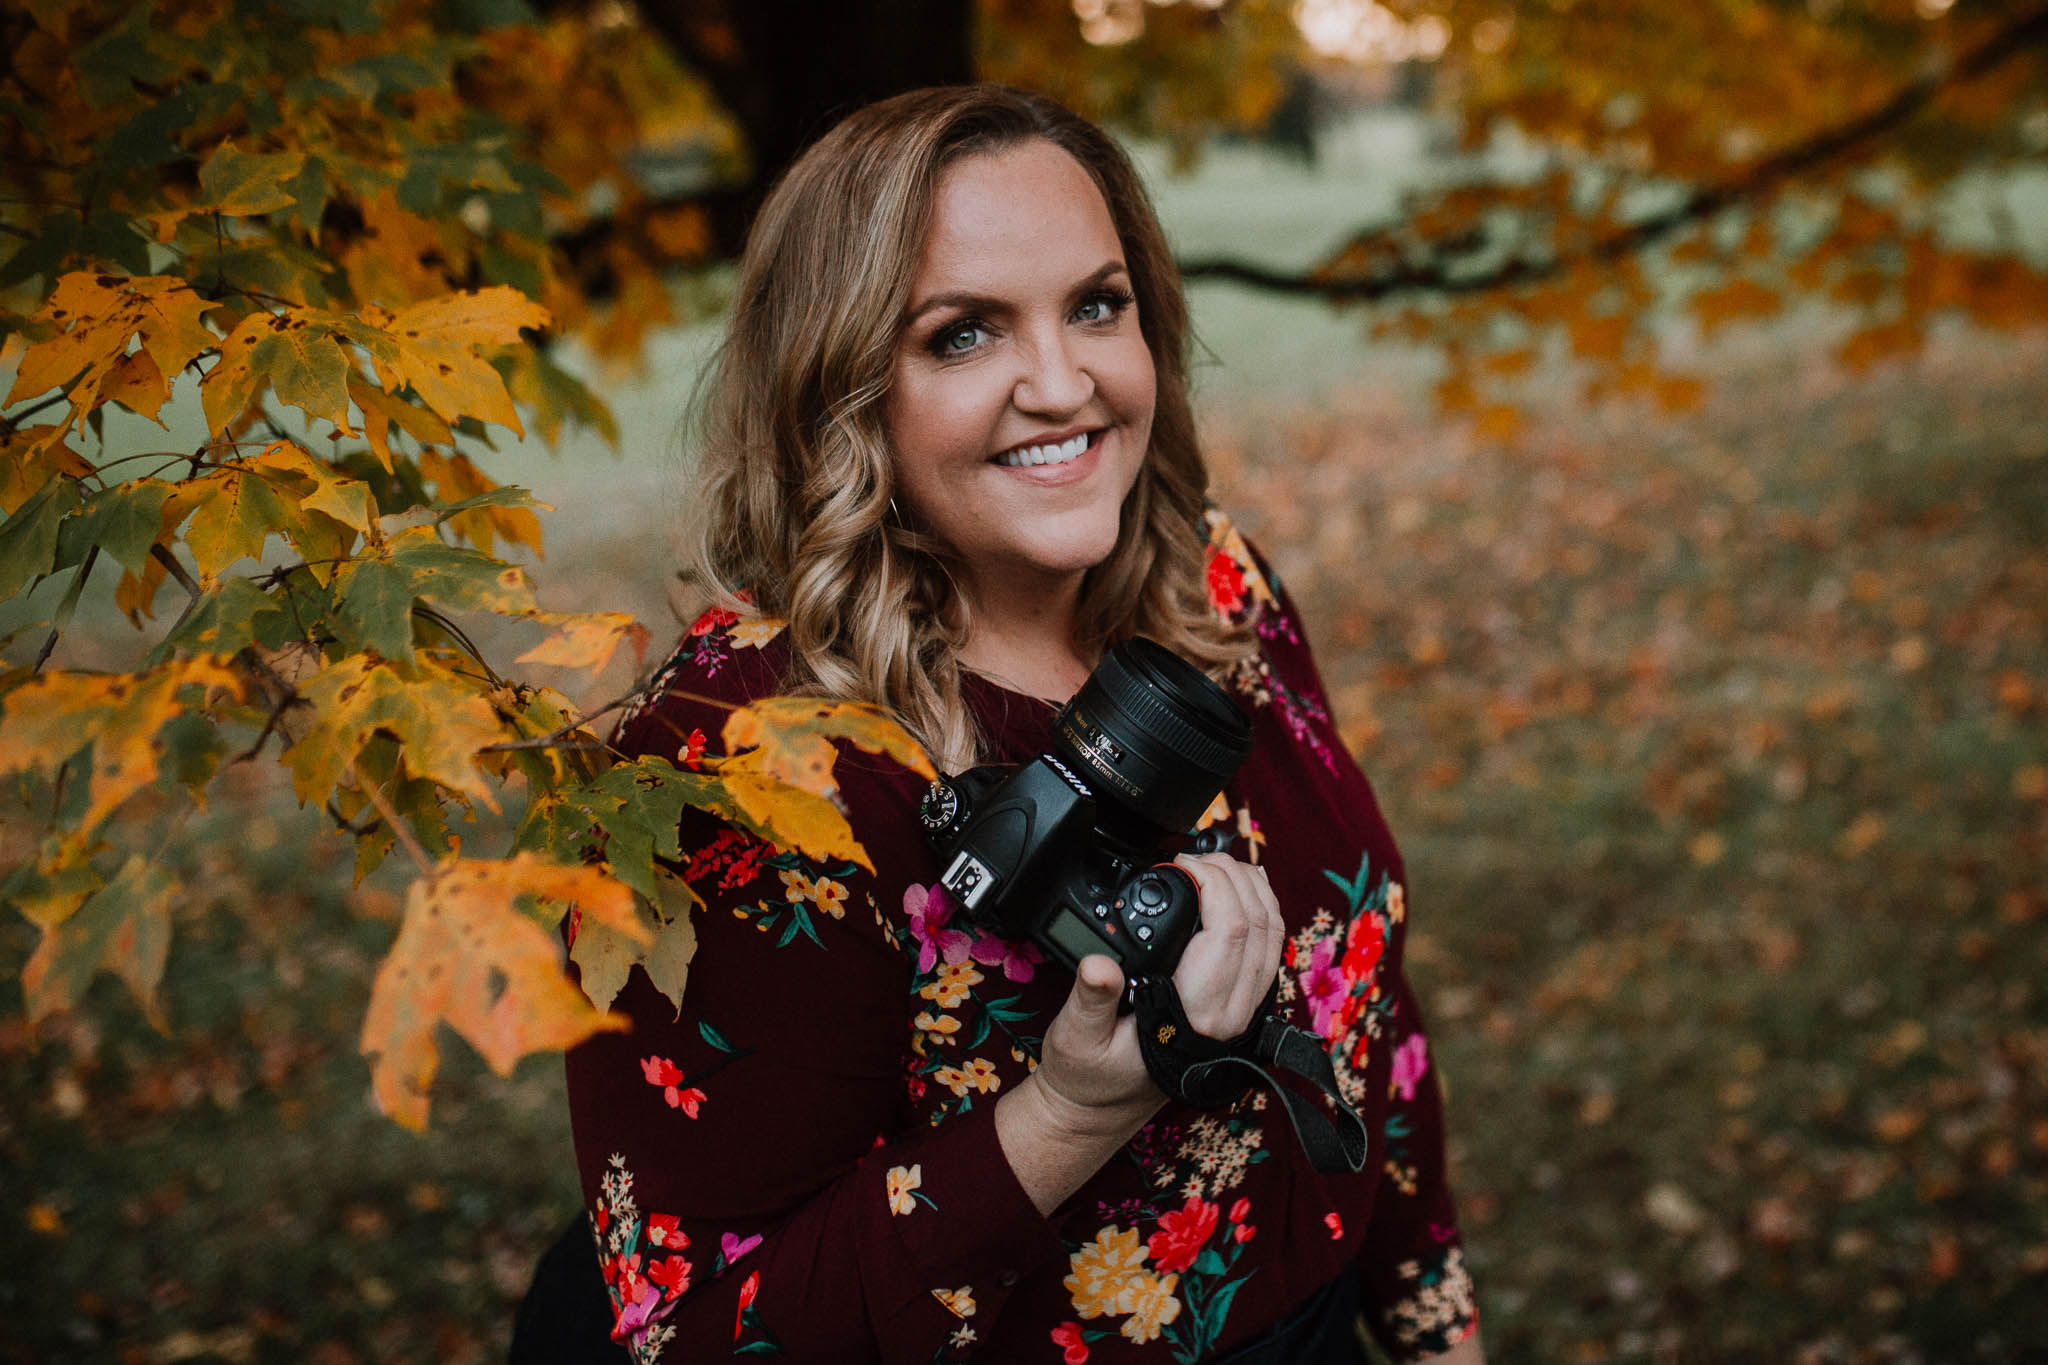 Kate Montaner head shot camera family lifestyle documentary Morven Park Leesburg Loudoun Virginia Fall Autumn Marti Austin Photography